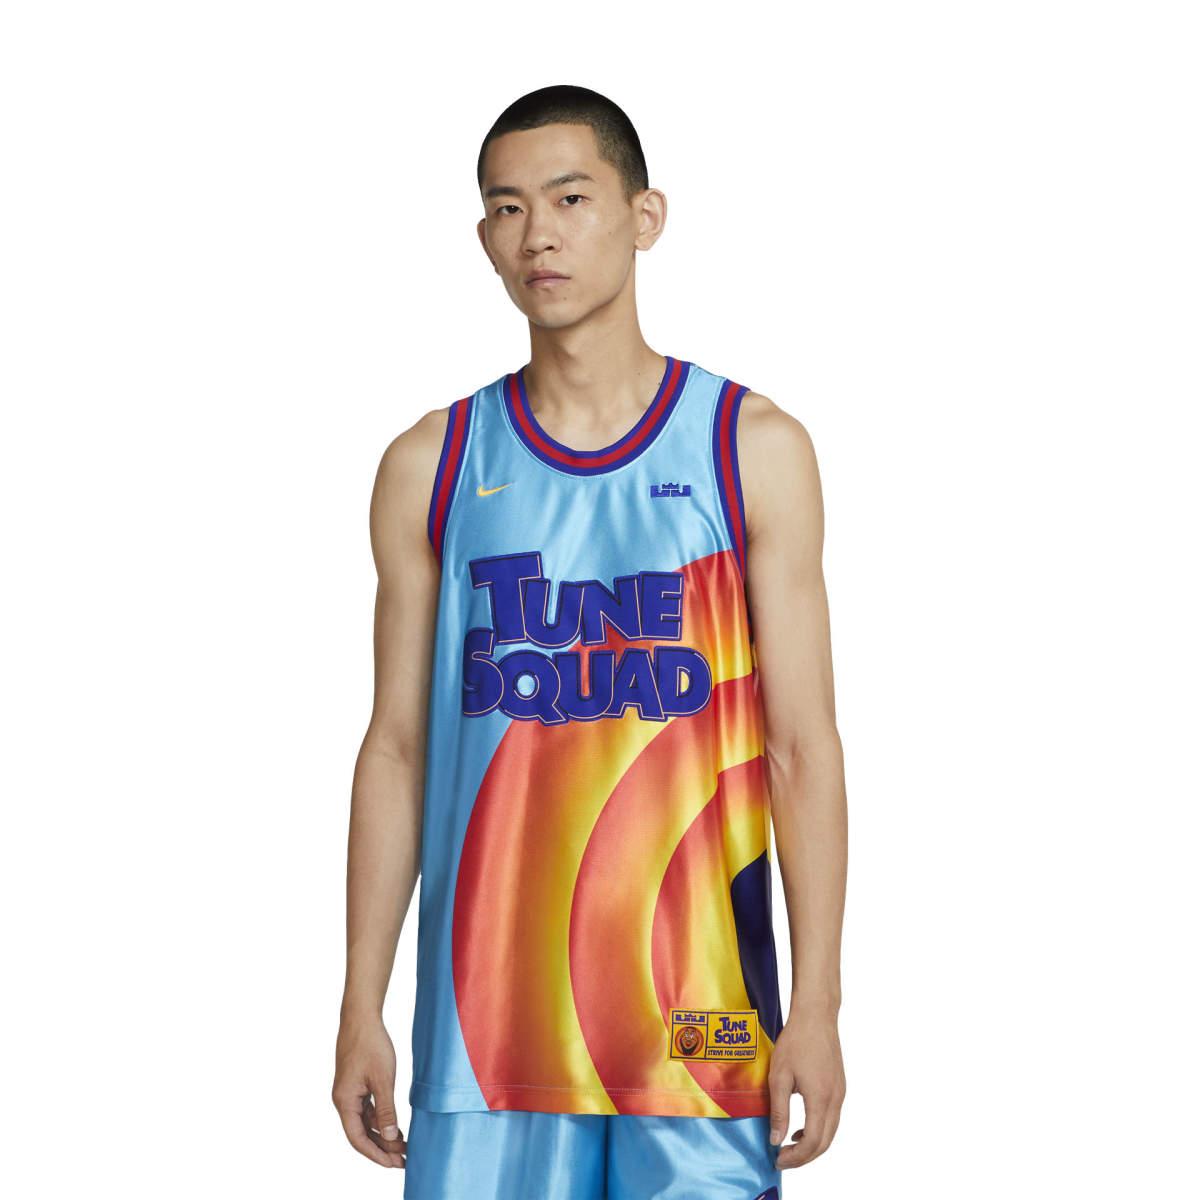 Lebron x space jam tune squad jersey